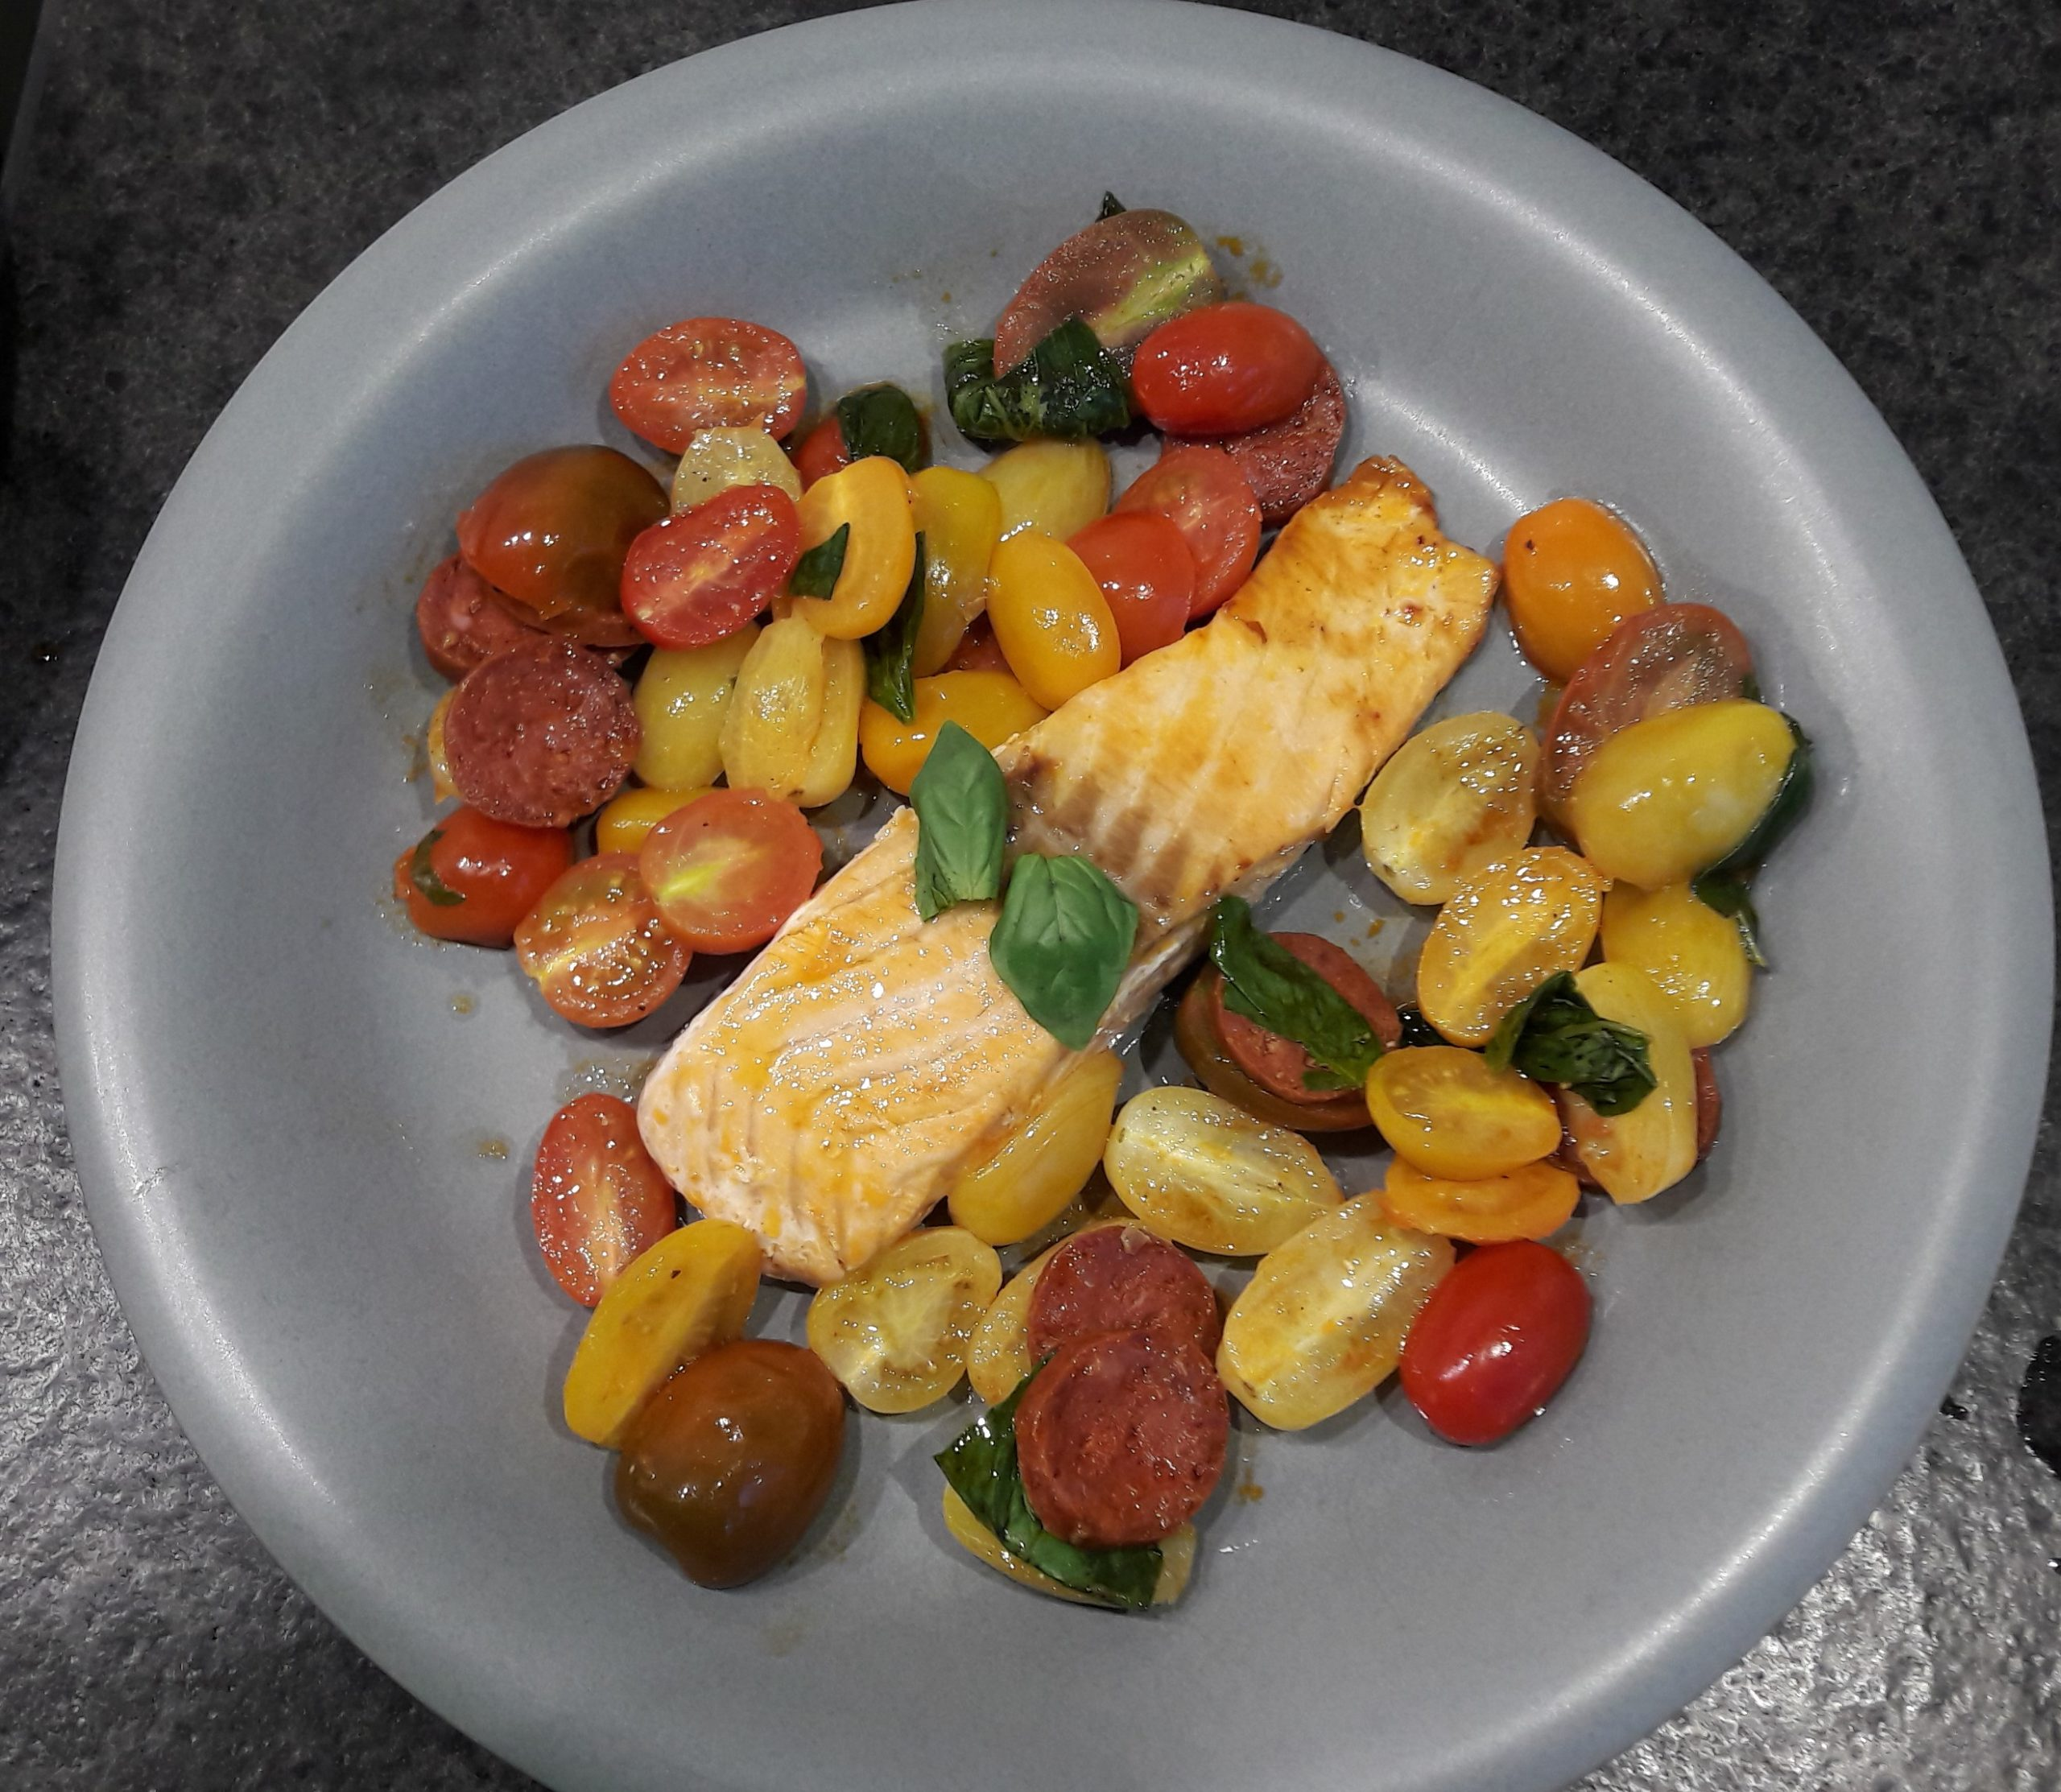 Jamies 16 Zutaten Küche – Miri kocht